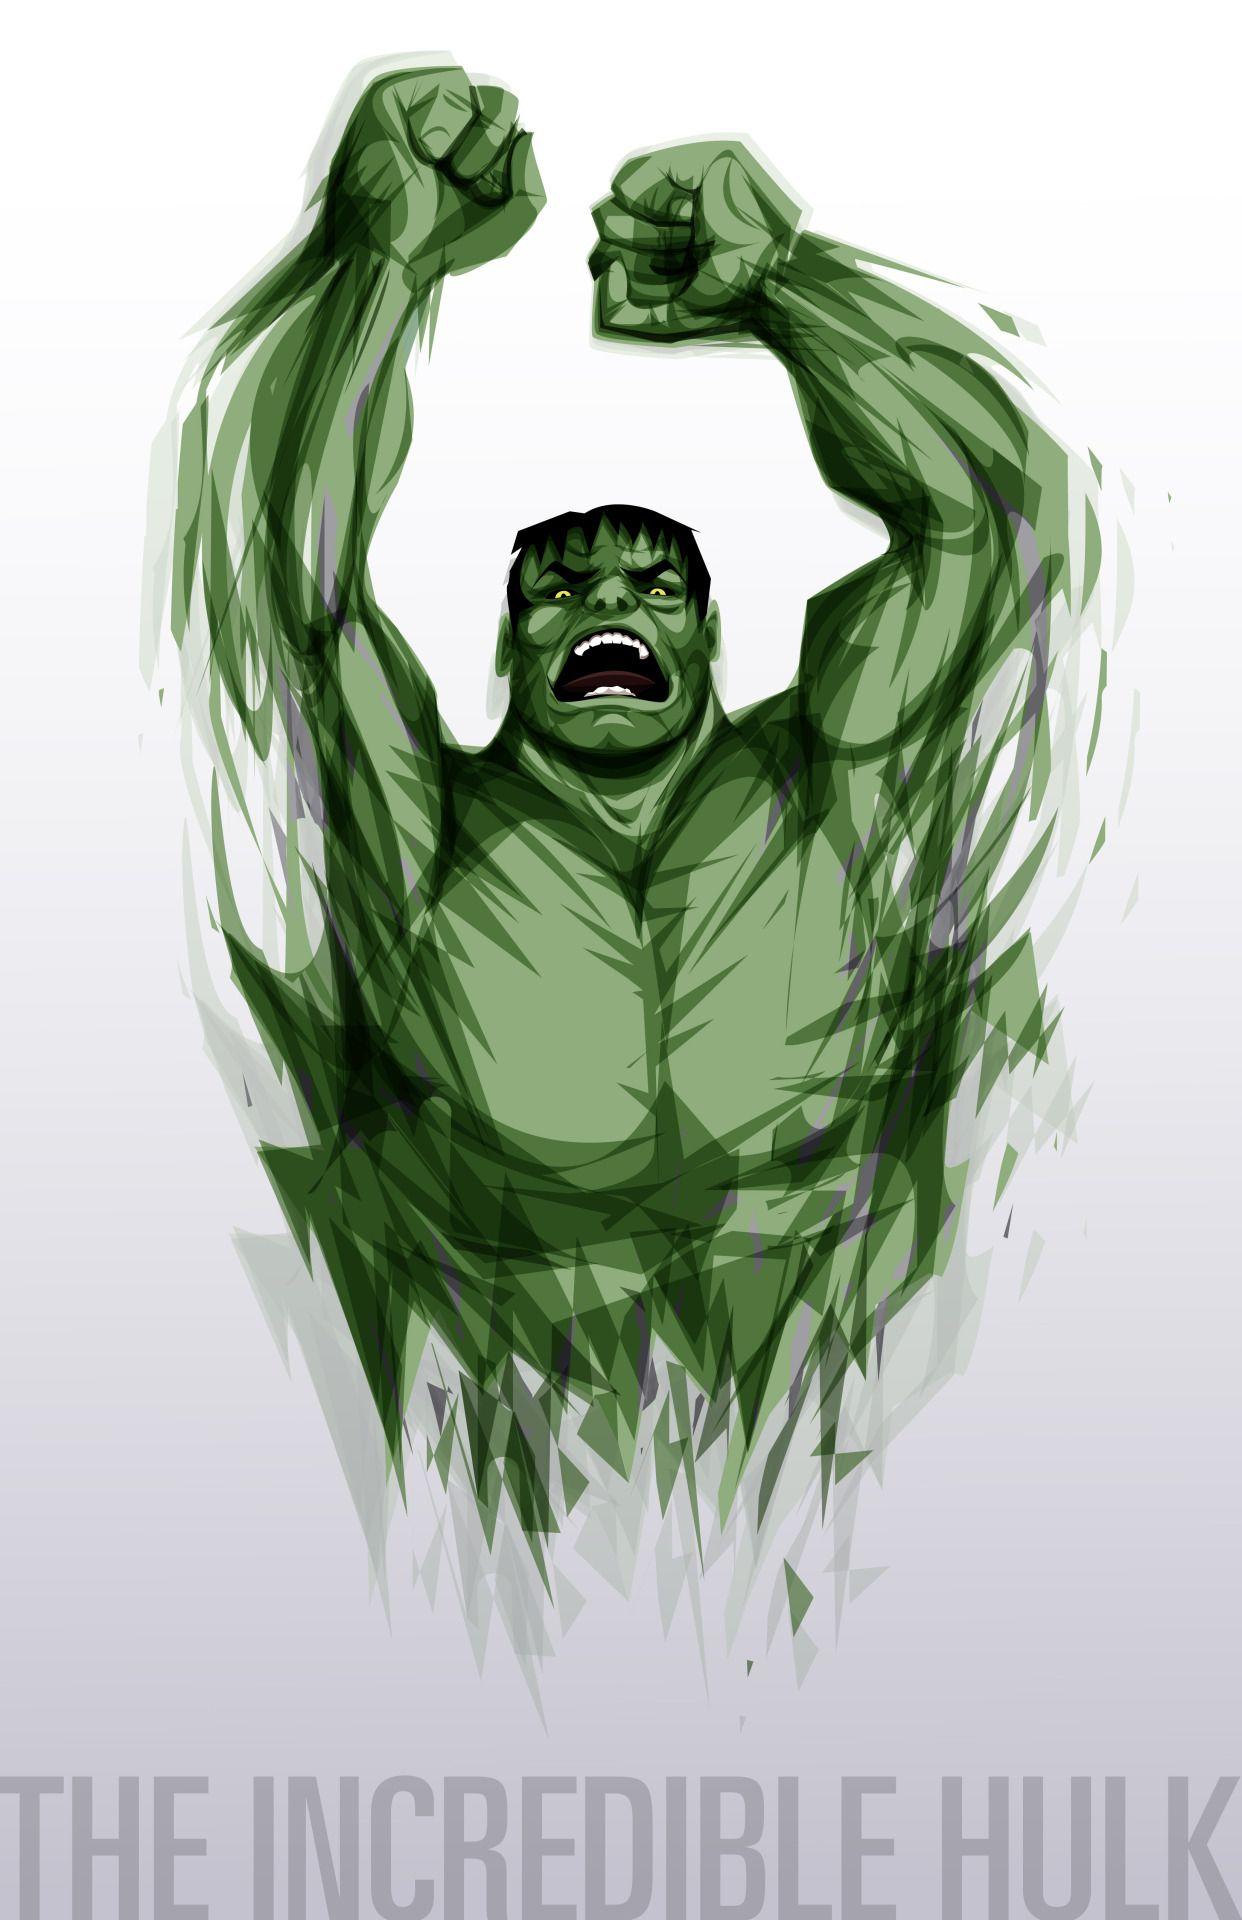 HULK ICONIC GREEN ARTWORK T SHIRT